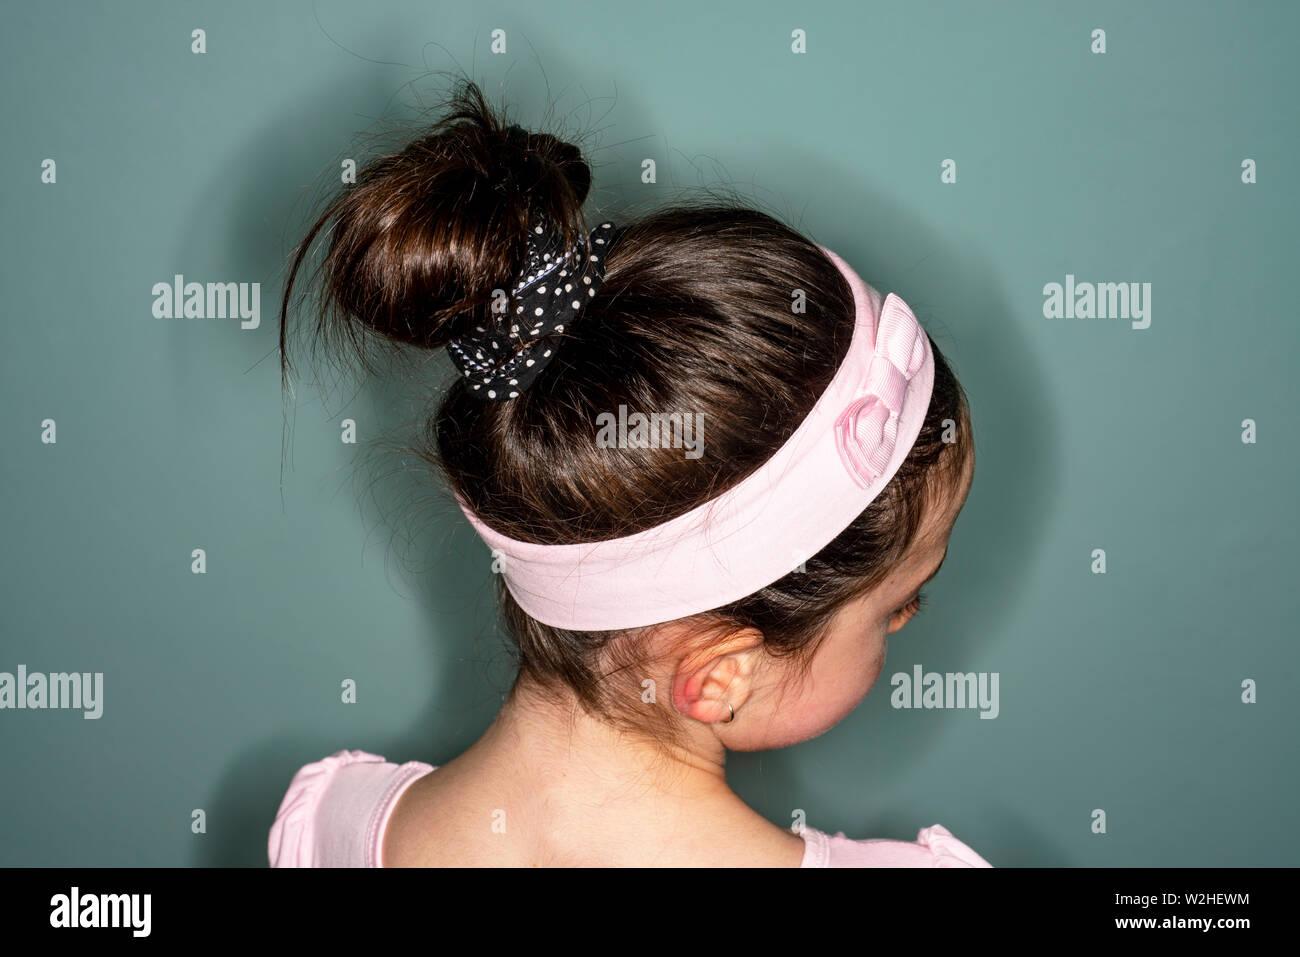 Ballerina Frisur Stockfotos Ballerina Frisur Bilder Alamy